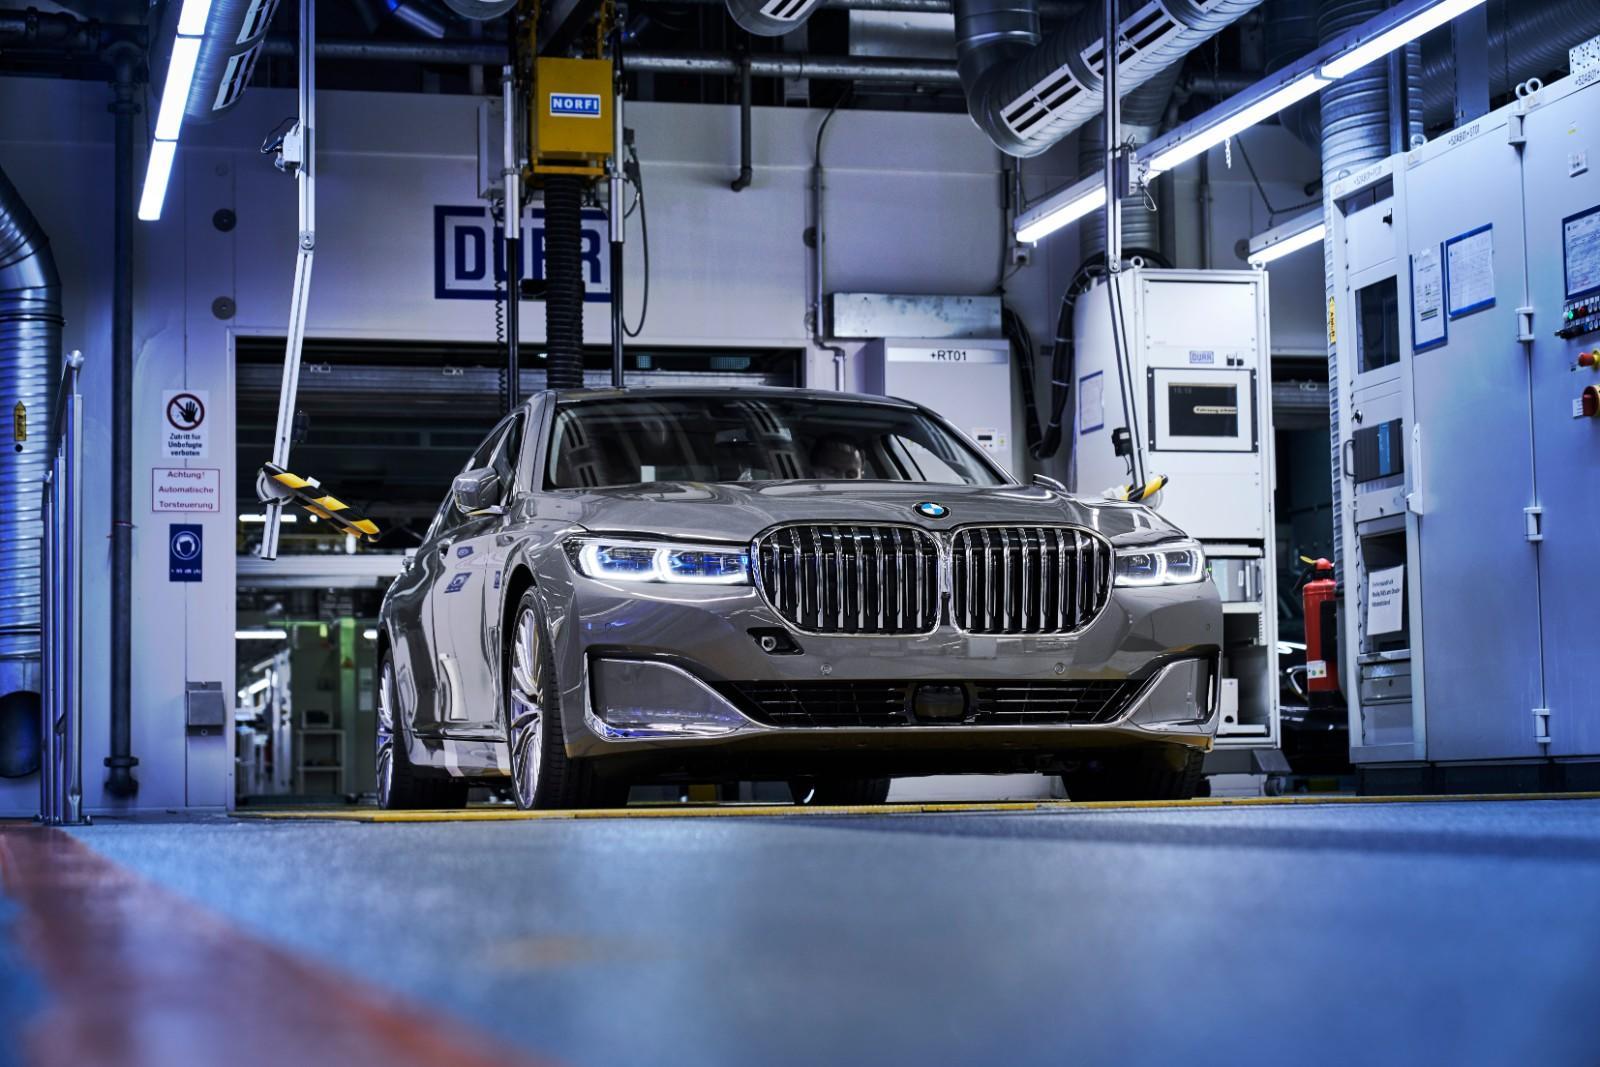 BMW Seria 7 facelift - BMW Seria 7 facelift